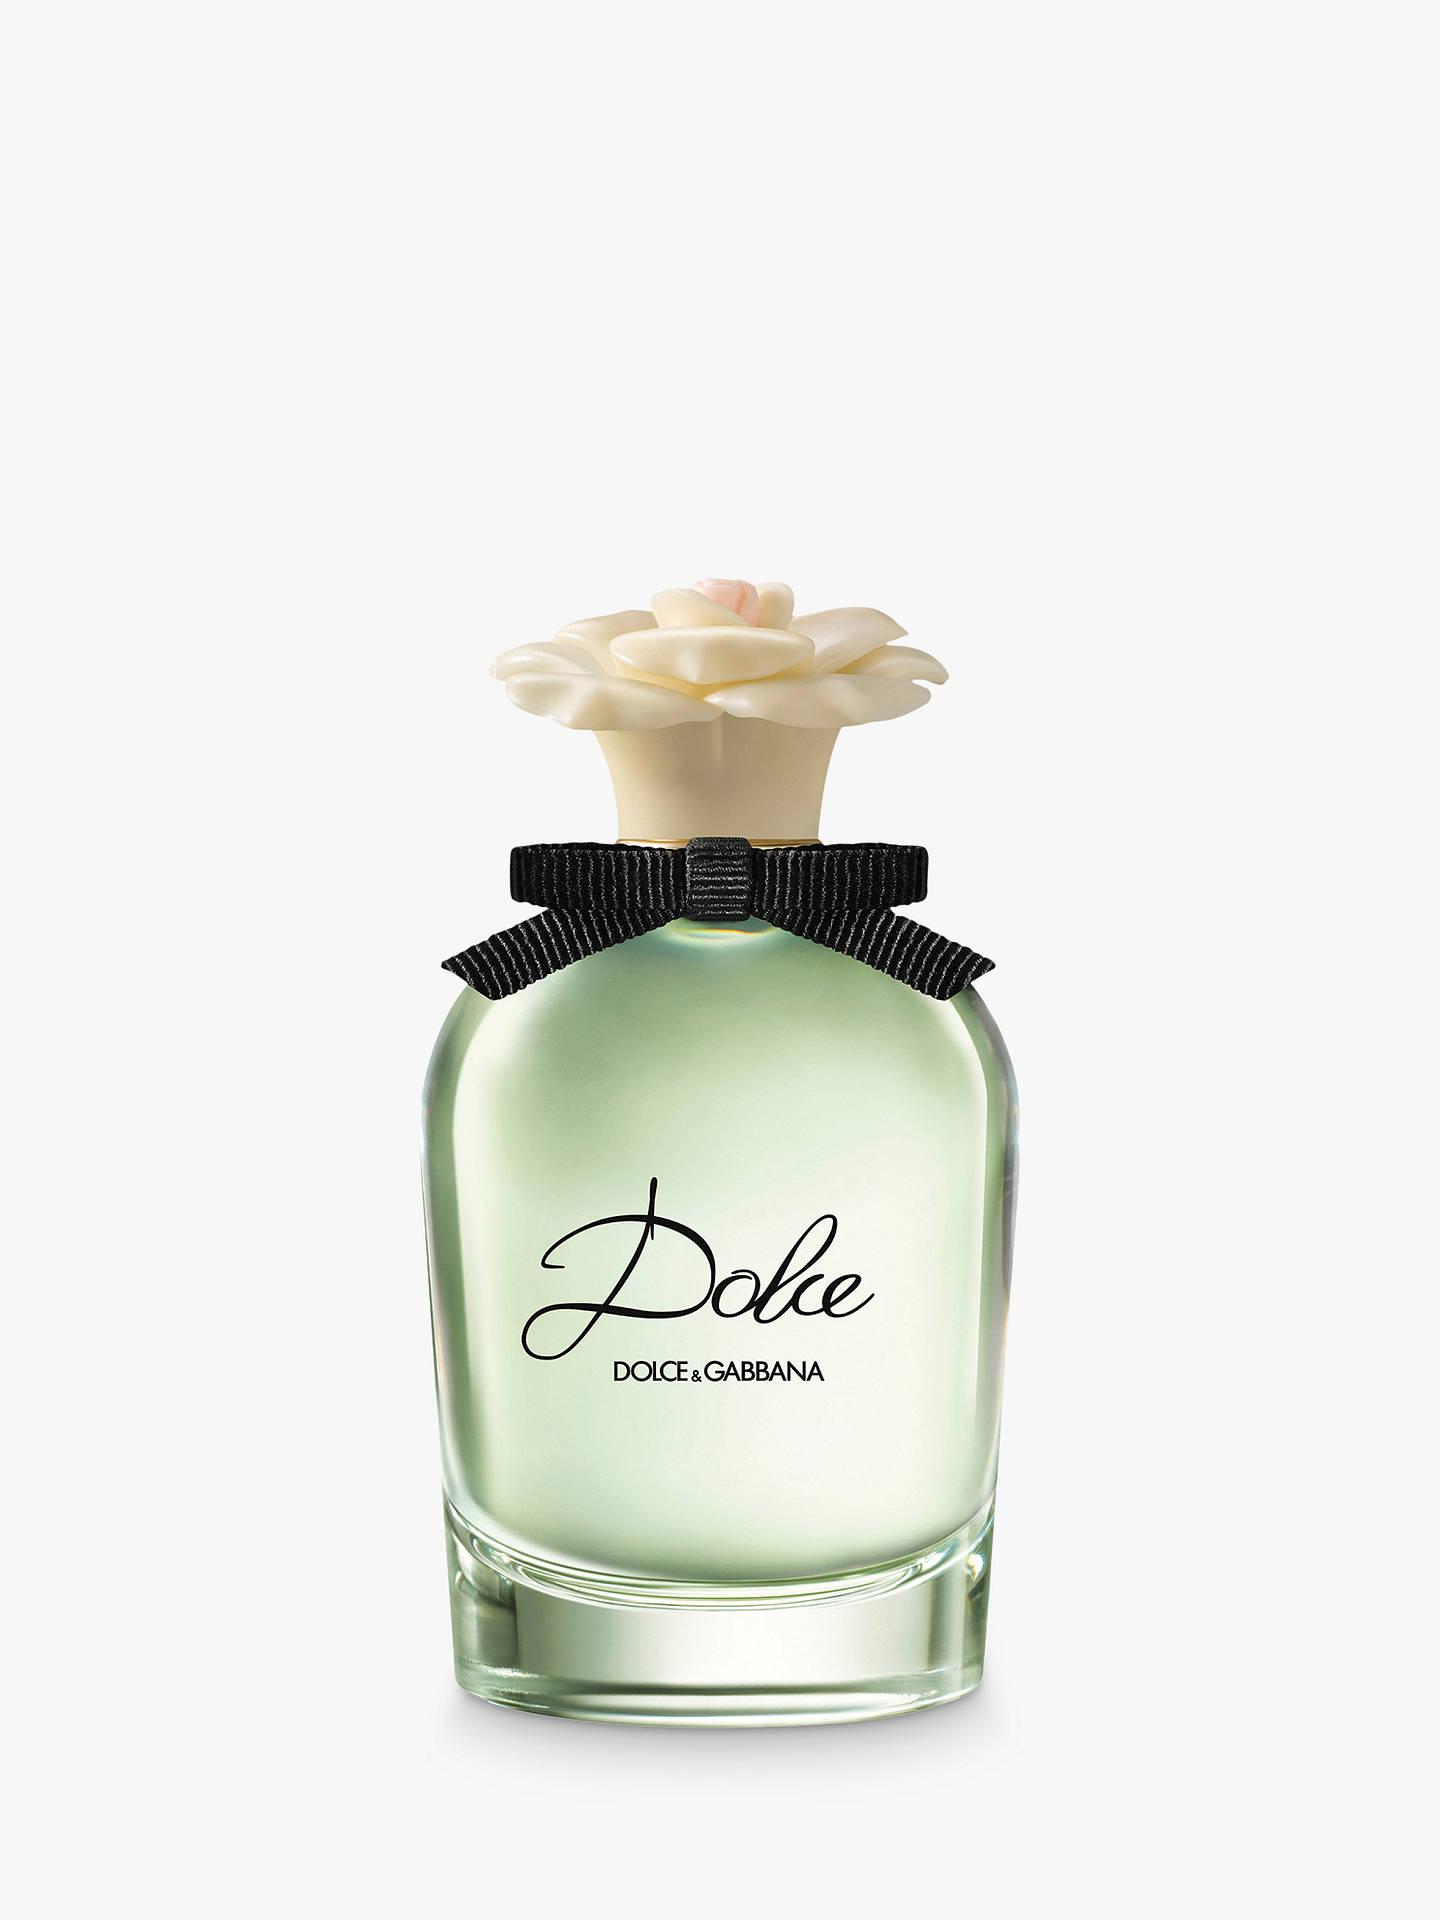 Lewis At John Gabbana Parfum75ml Partners De Dolceamp; Eau eWrCoEQBdx